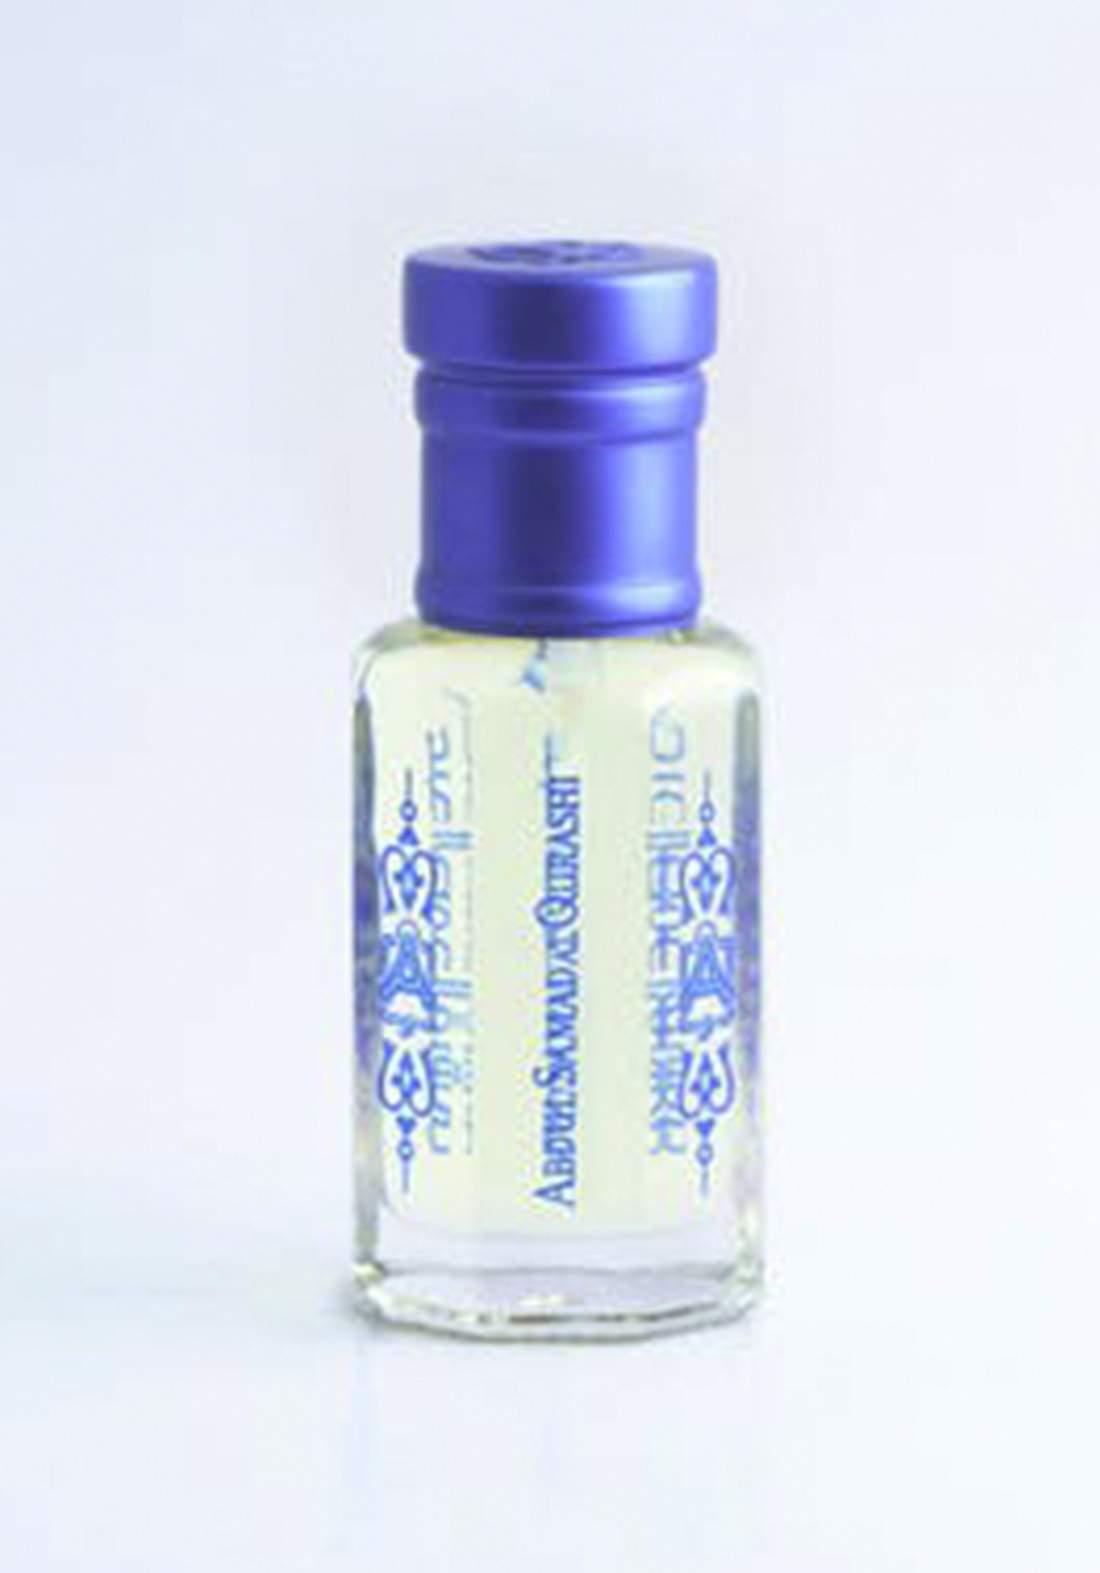 Abdul Samad Al Qurashi-41005  sectarian roses 500 mix Perfume Oil 12g  عطر زيتي